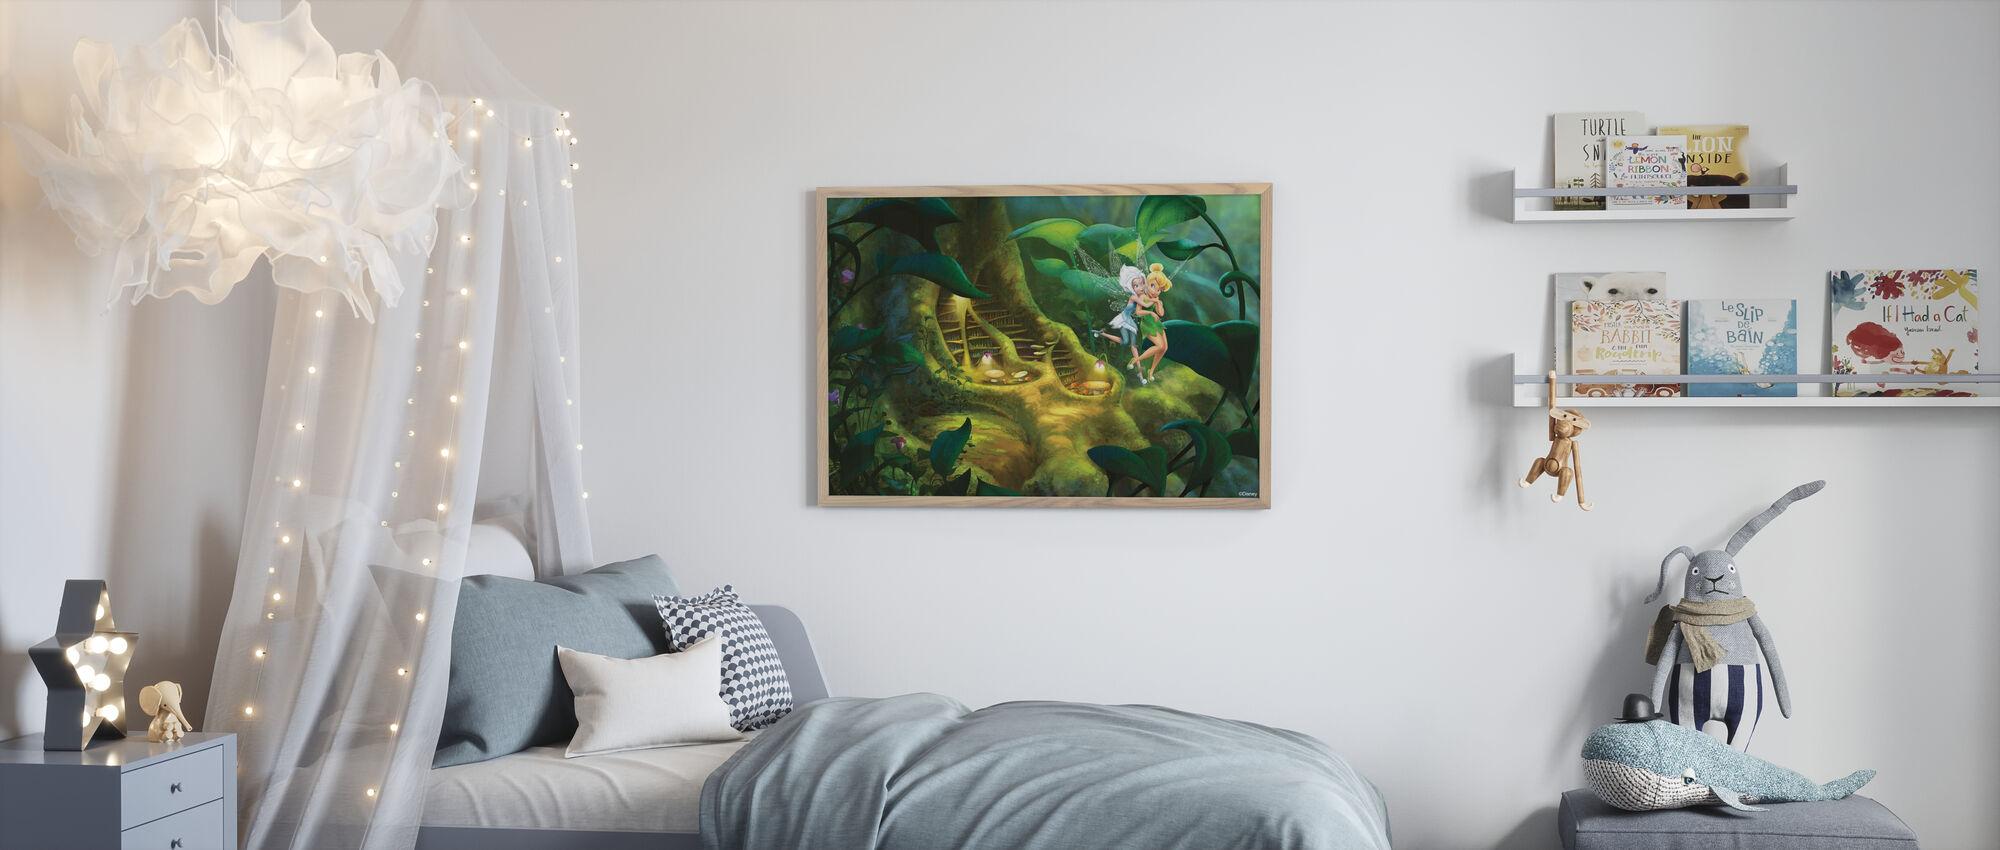 Fairies - Roten av treet - Innrammet bilde - Barnerom